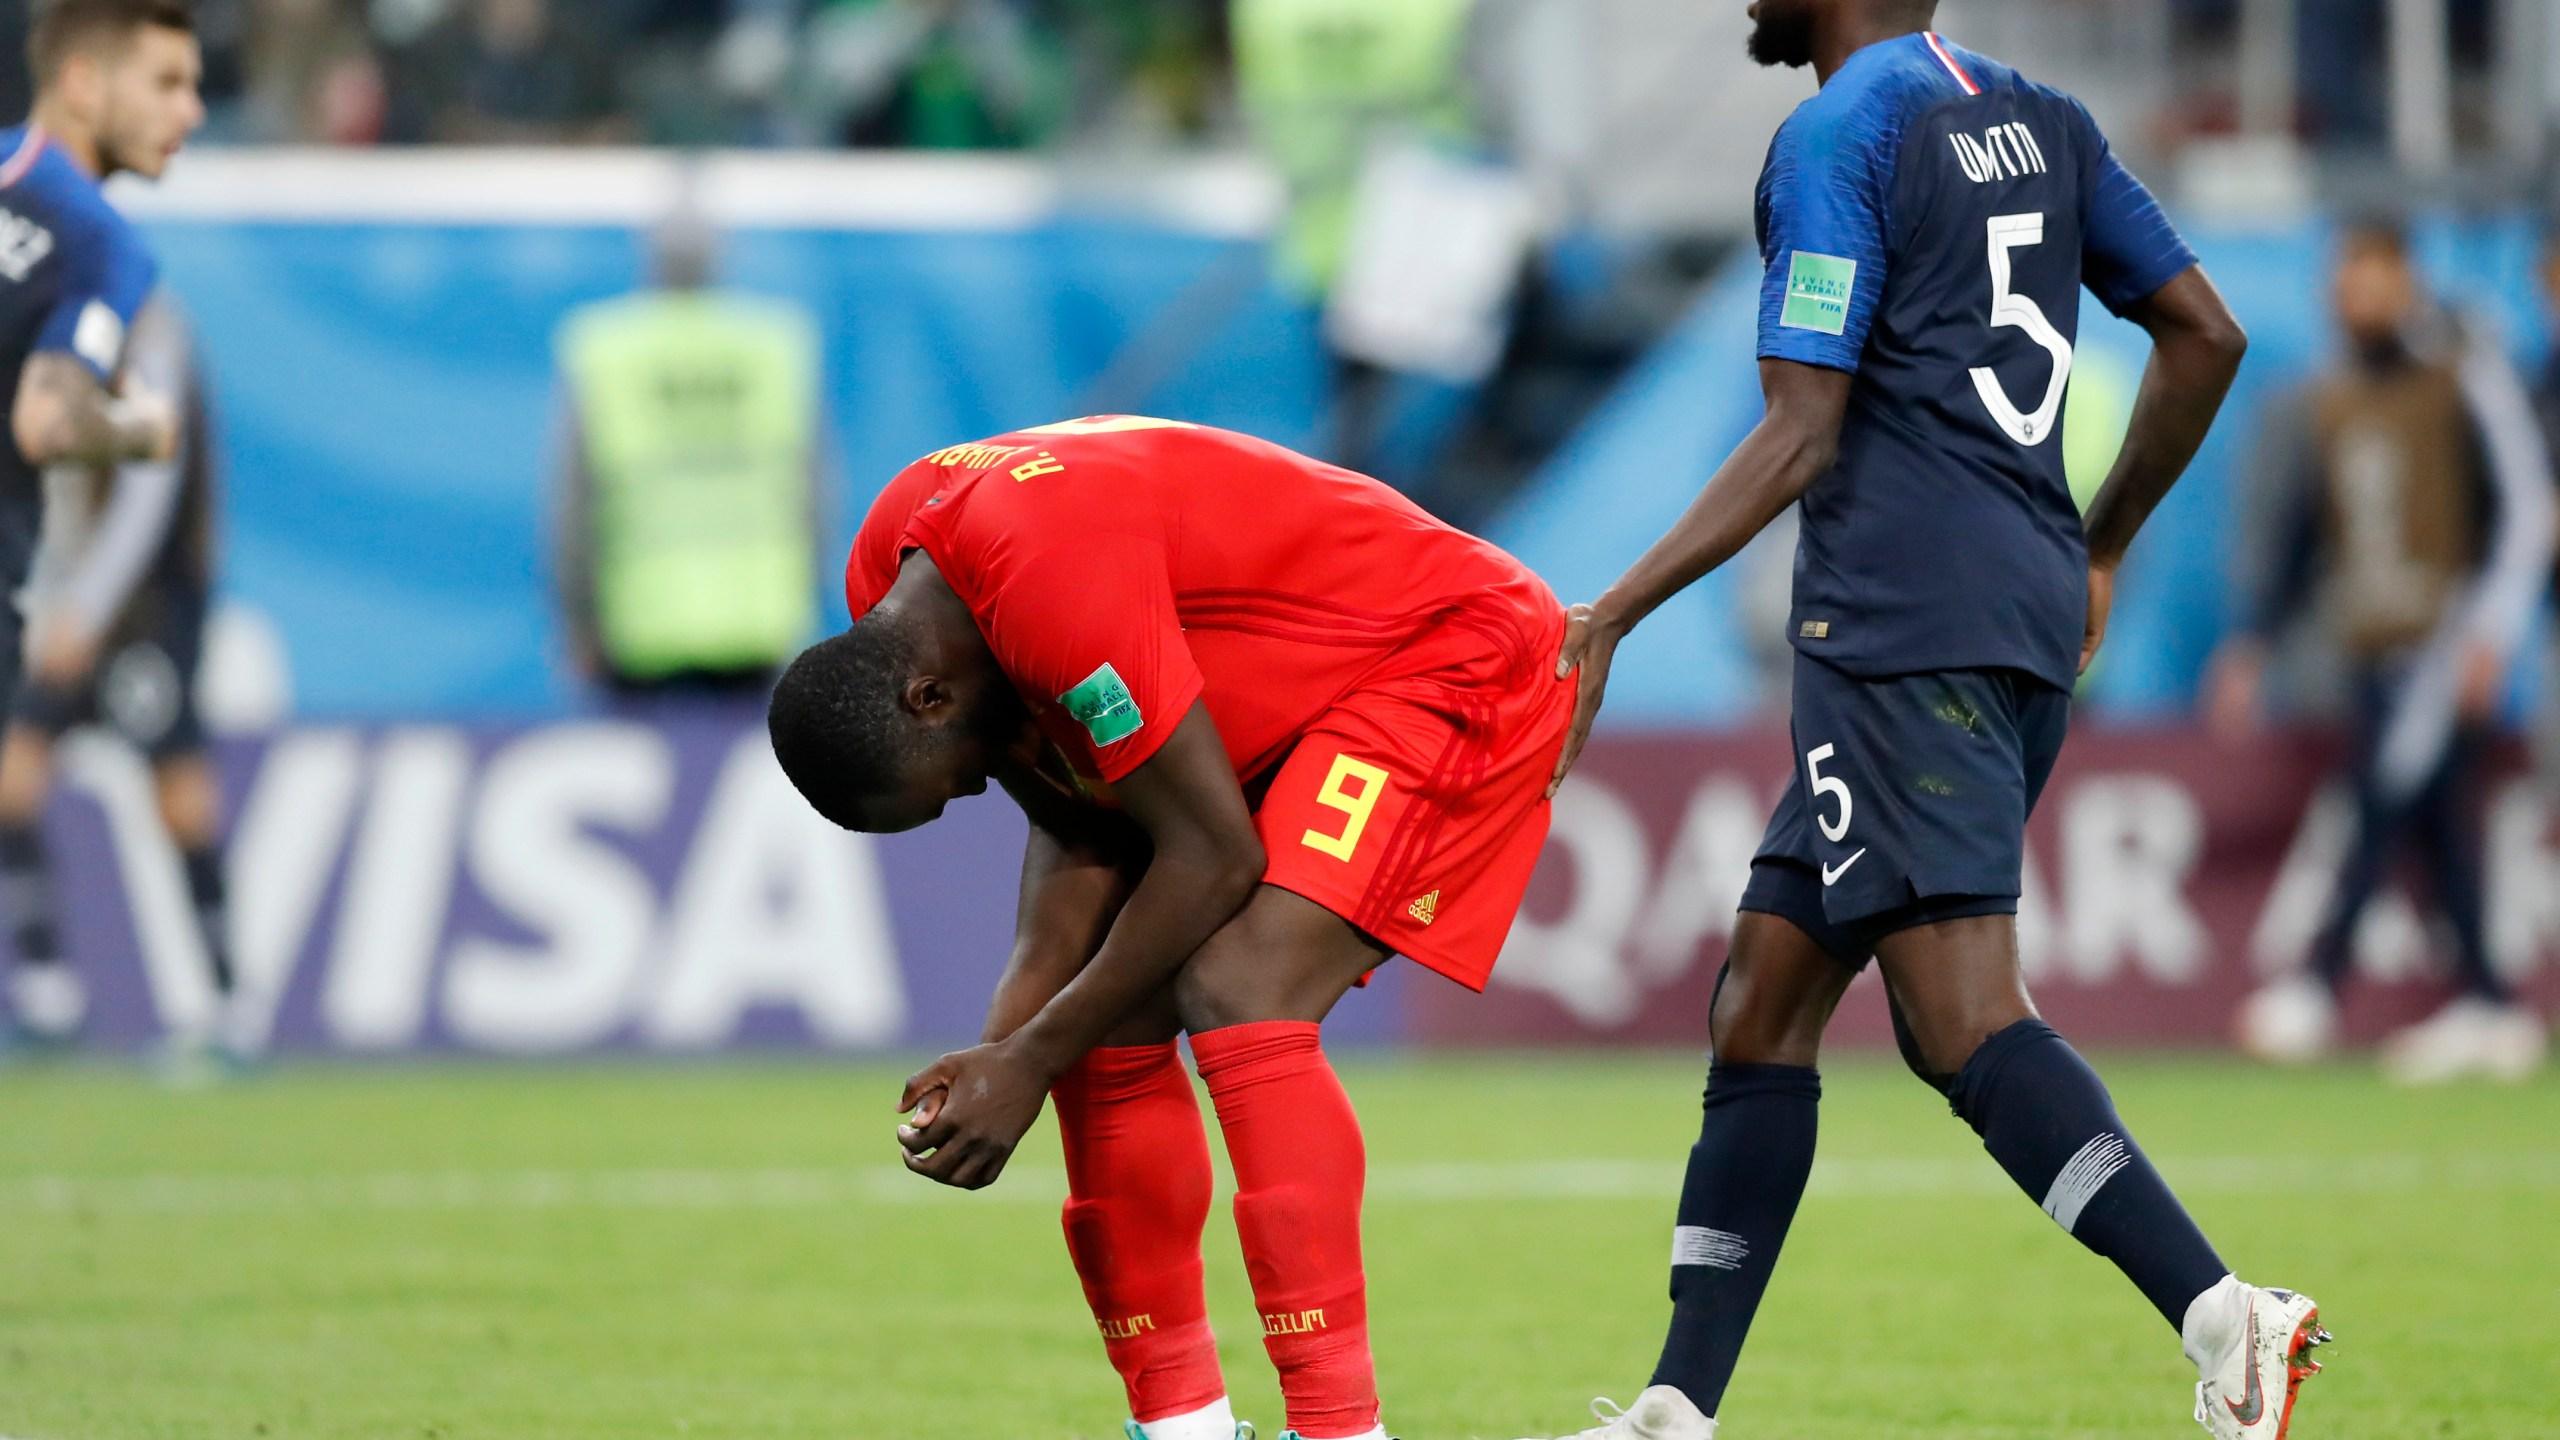 Russia_Soccer_WCup_France_Belgium_98004-159532.jpg66148312